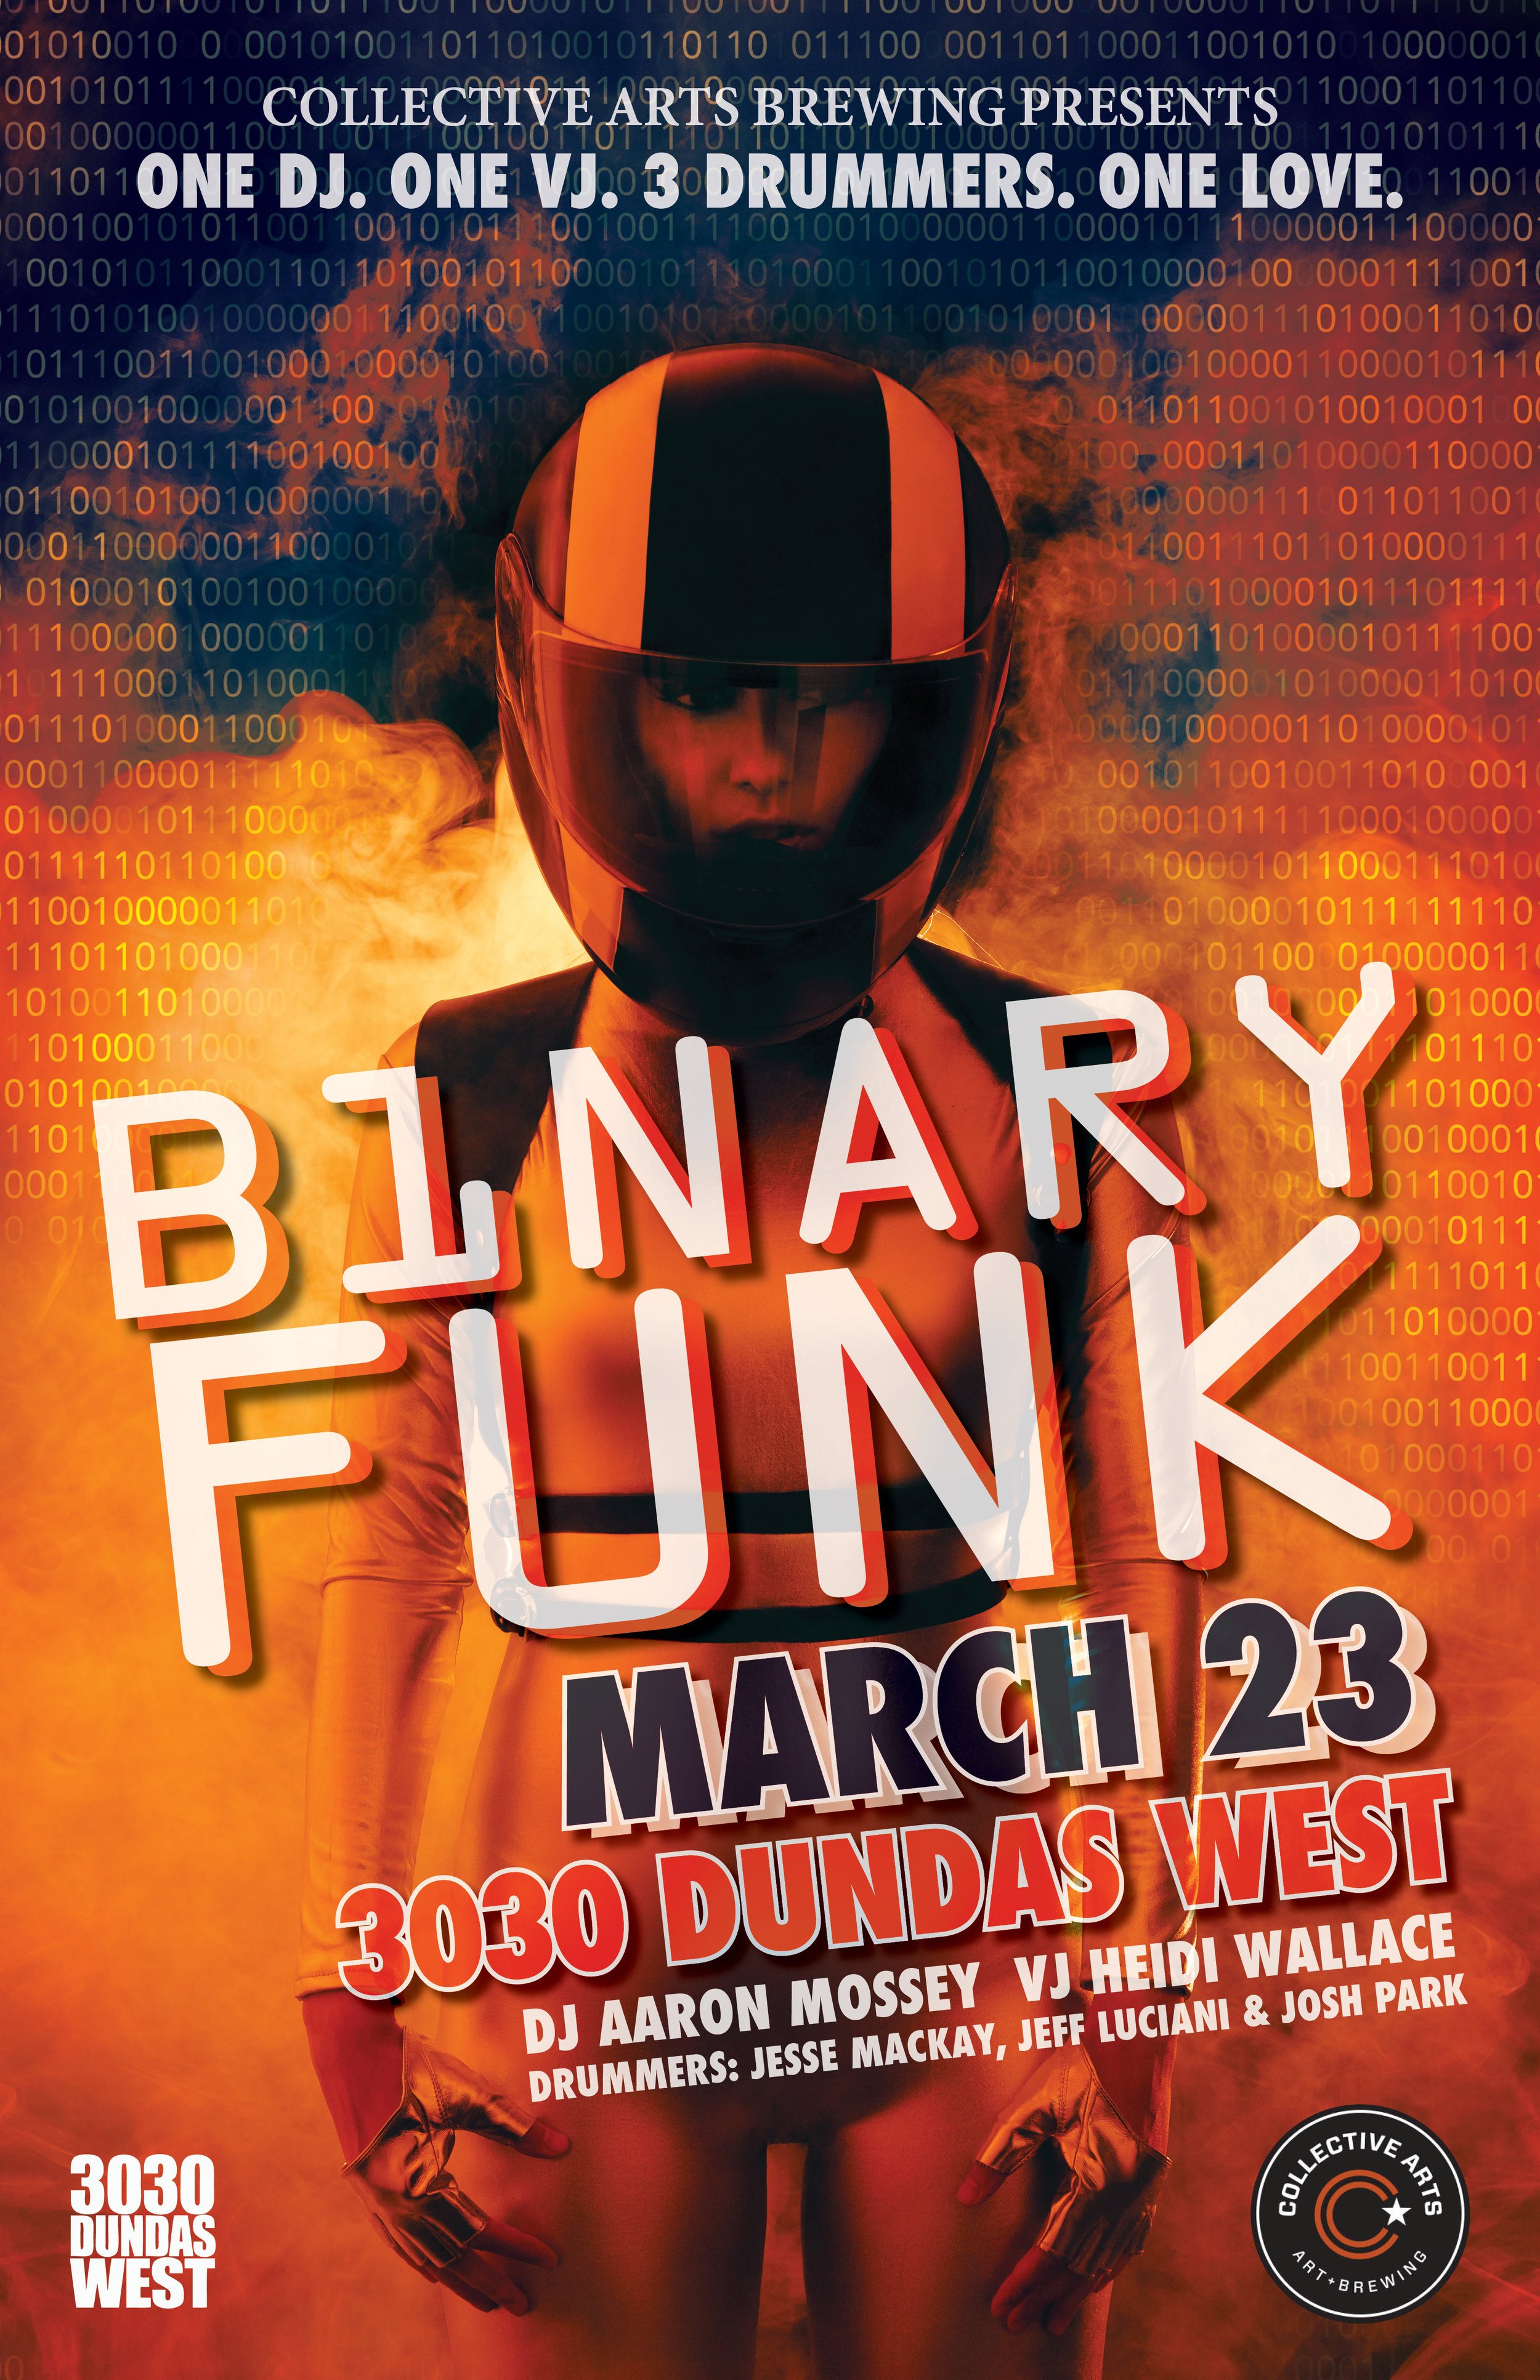 b1nary_funk_march2019_facebook.jpg